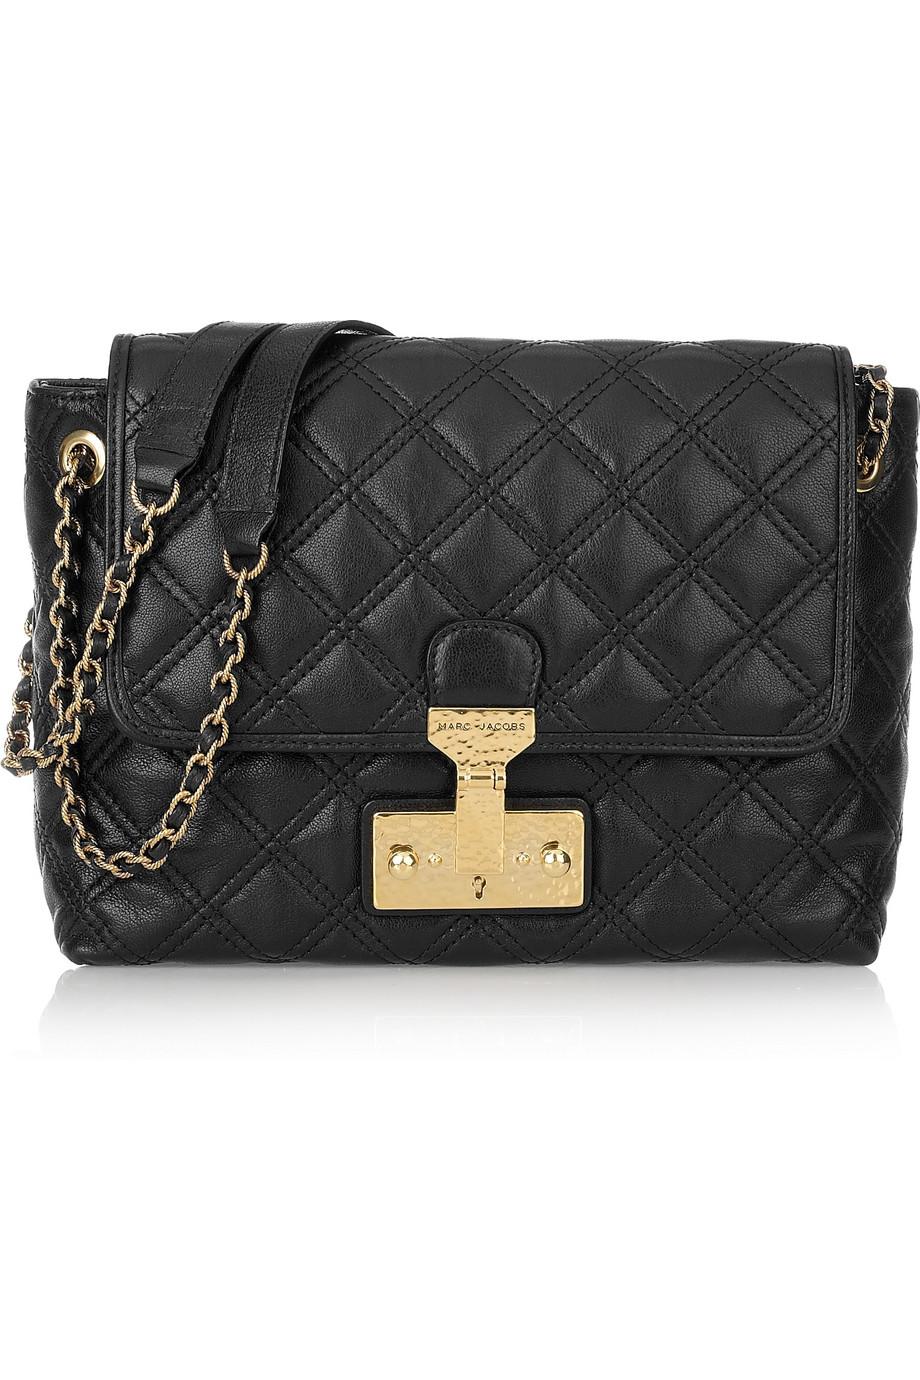 Lyst Marc Jacobs Baroque Single Leather Shoulder Bag In